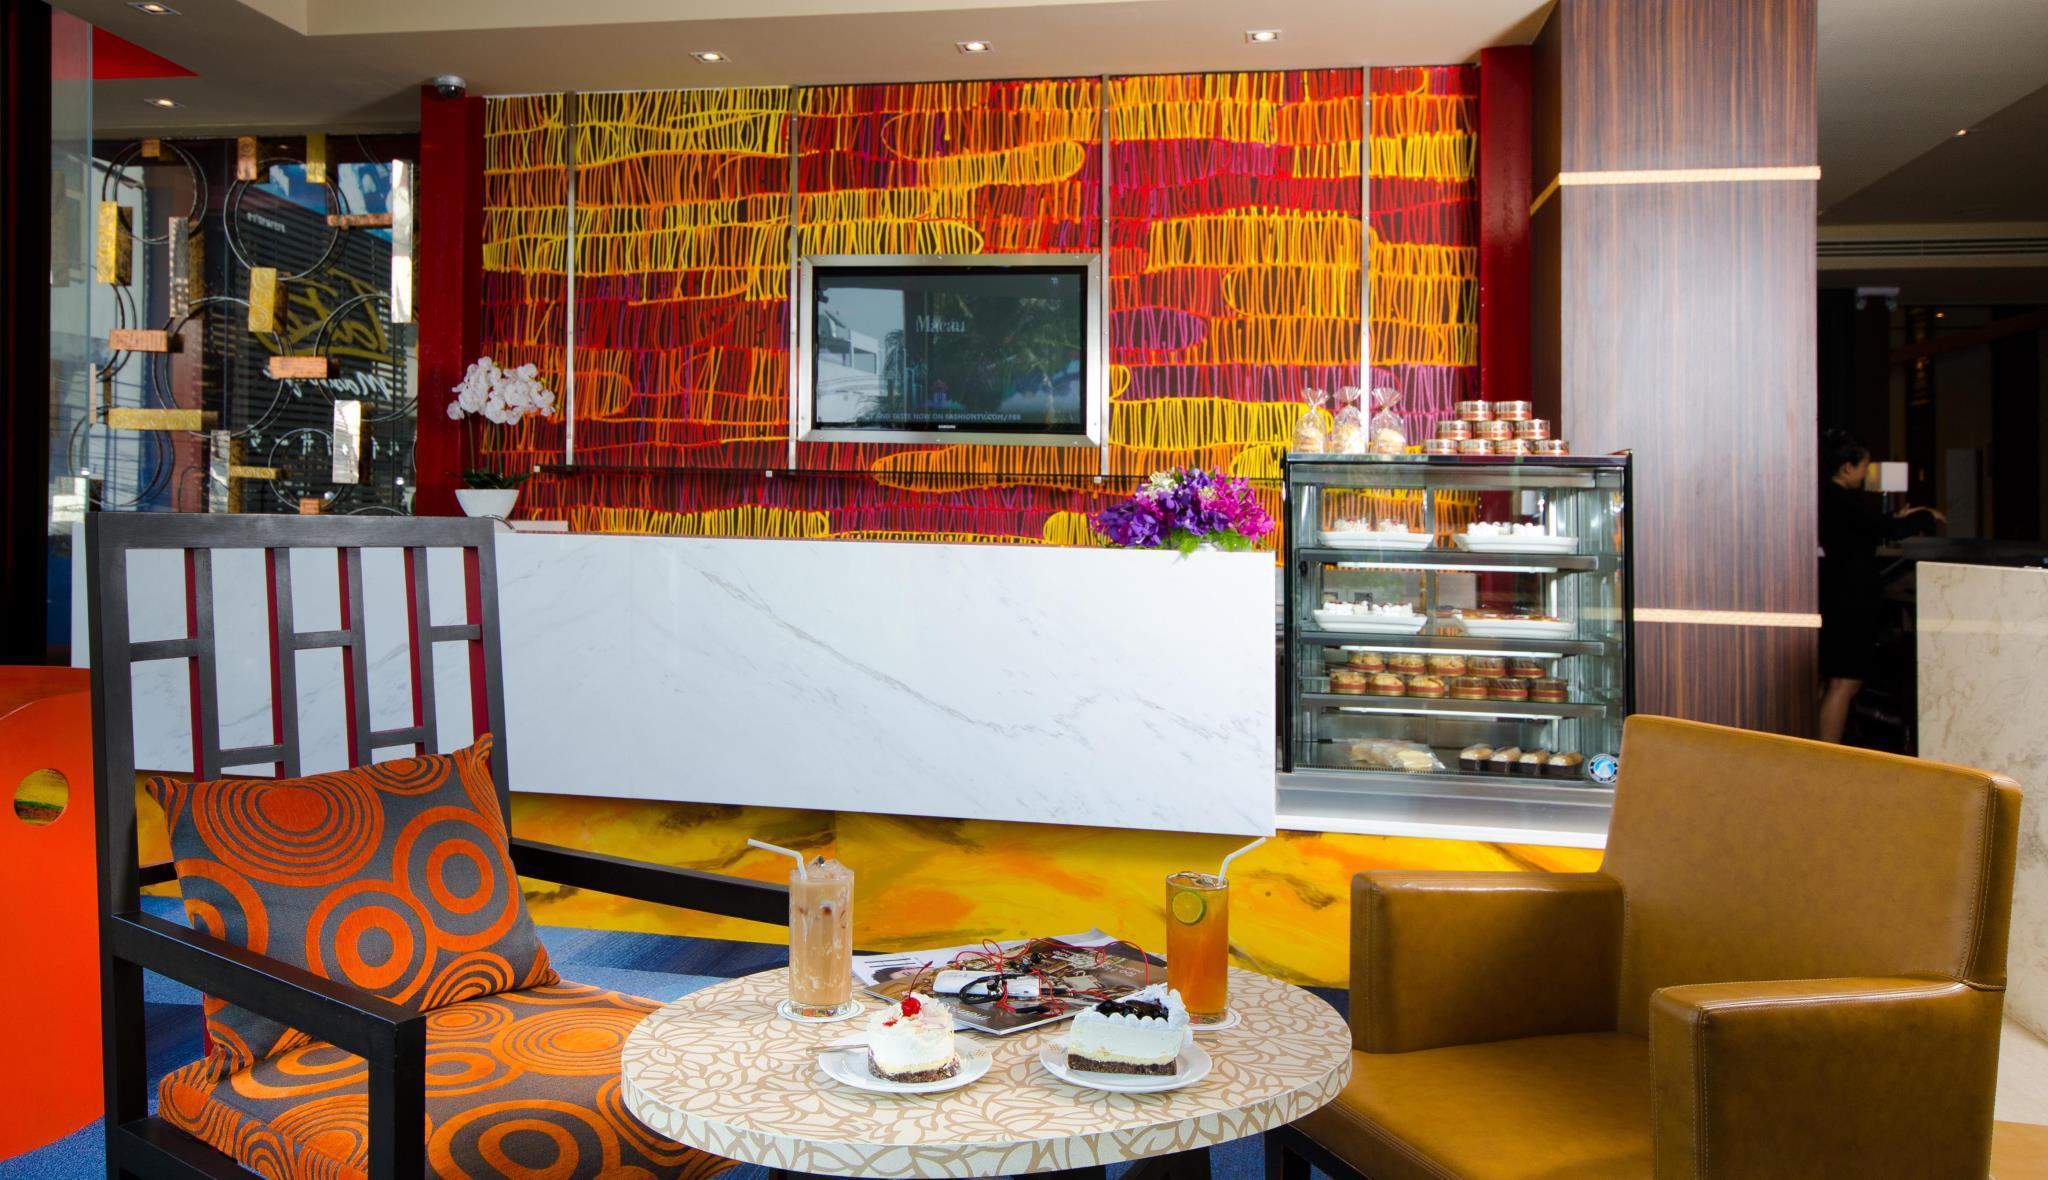 Tongtara Riverview Hotel โรงแรมทองธารา ริเวอร์วิว